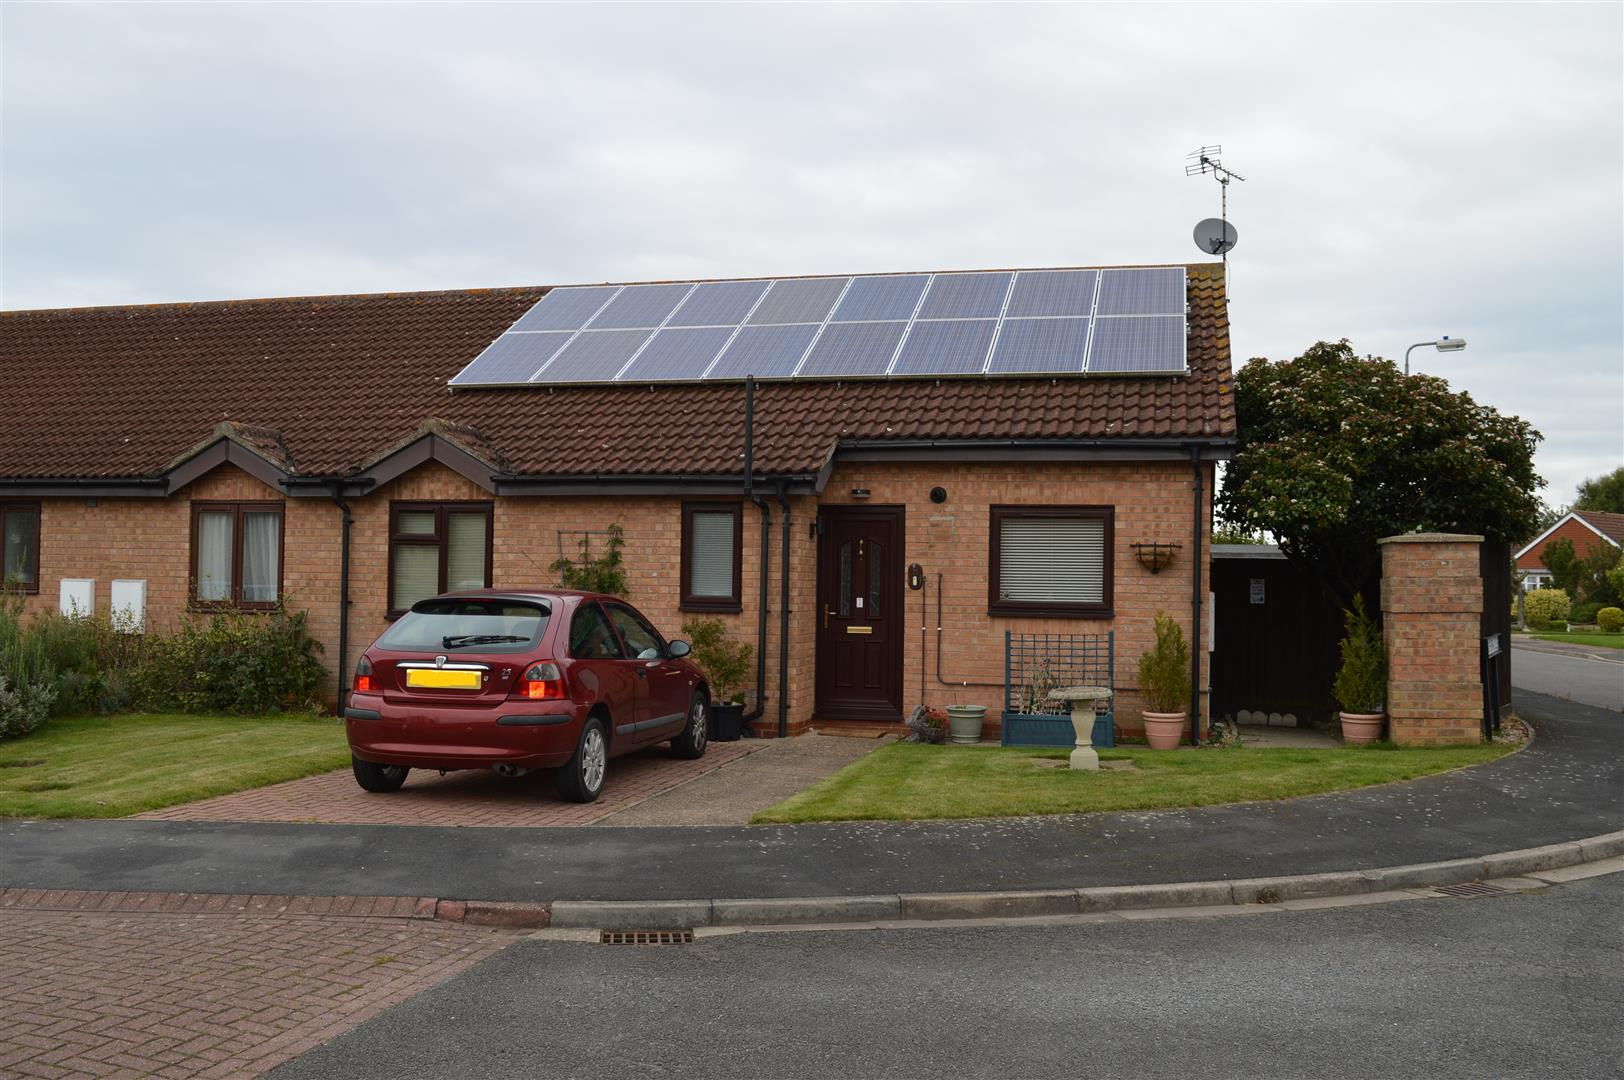 2 bedroom property in Heckington, Sleaford